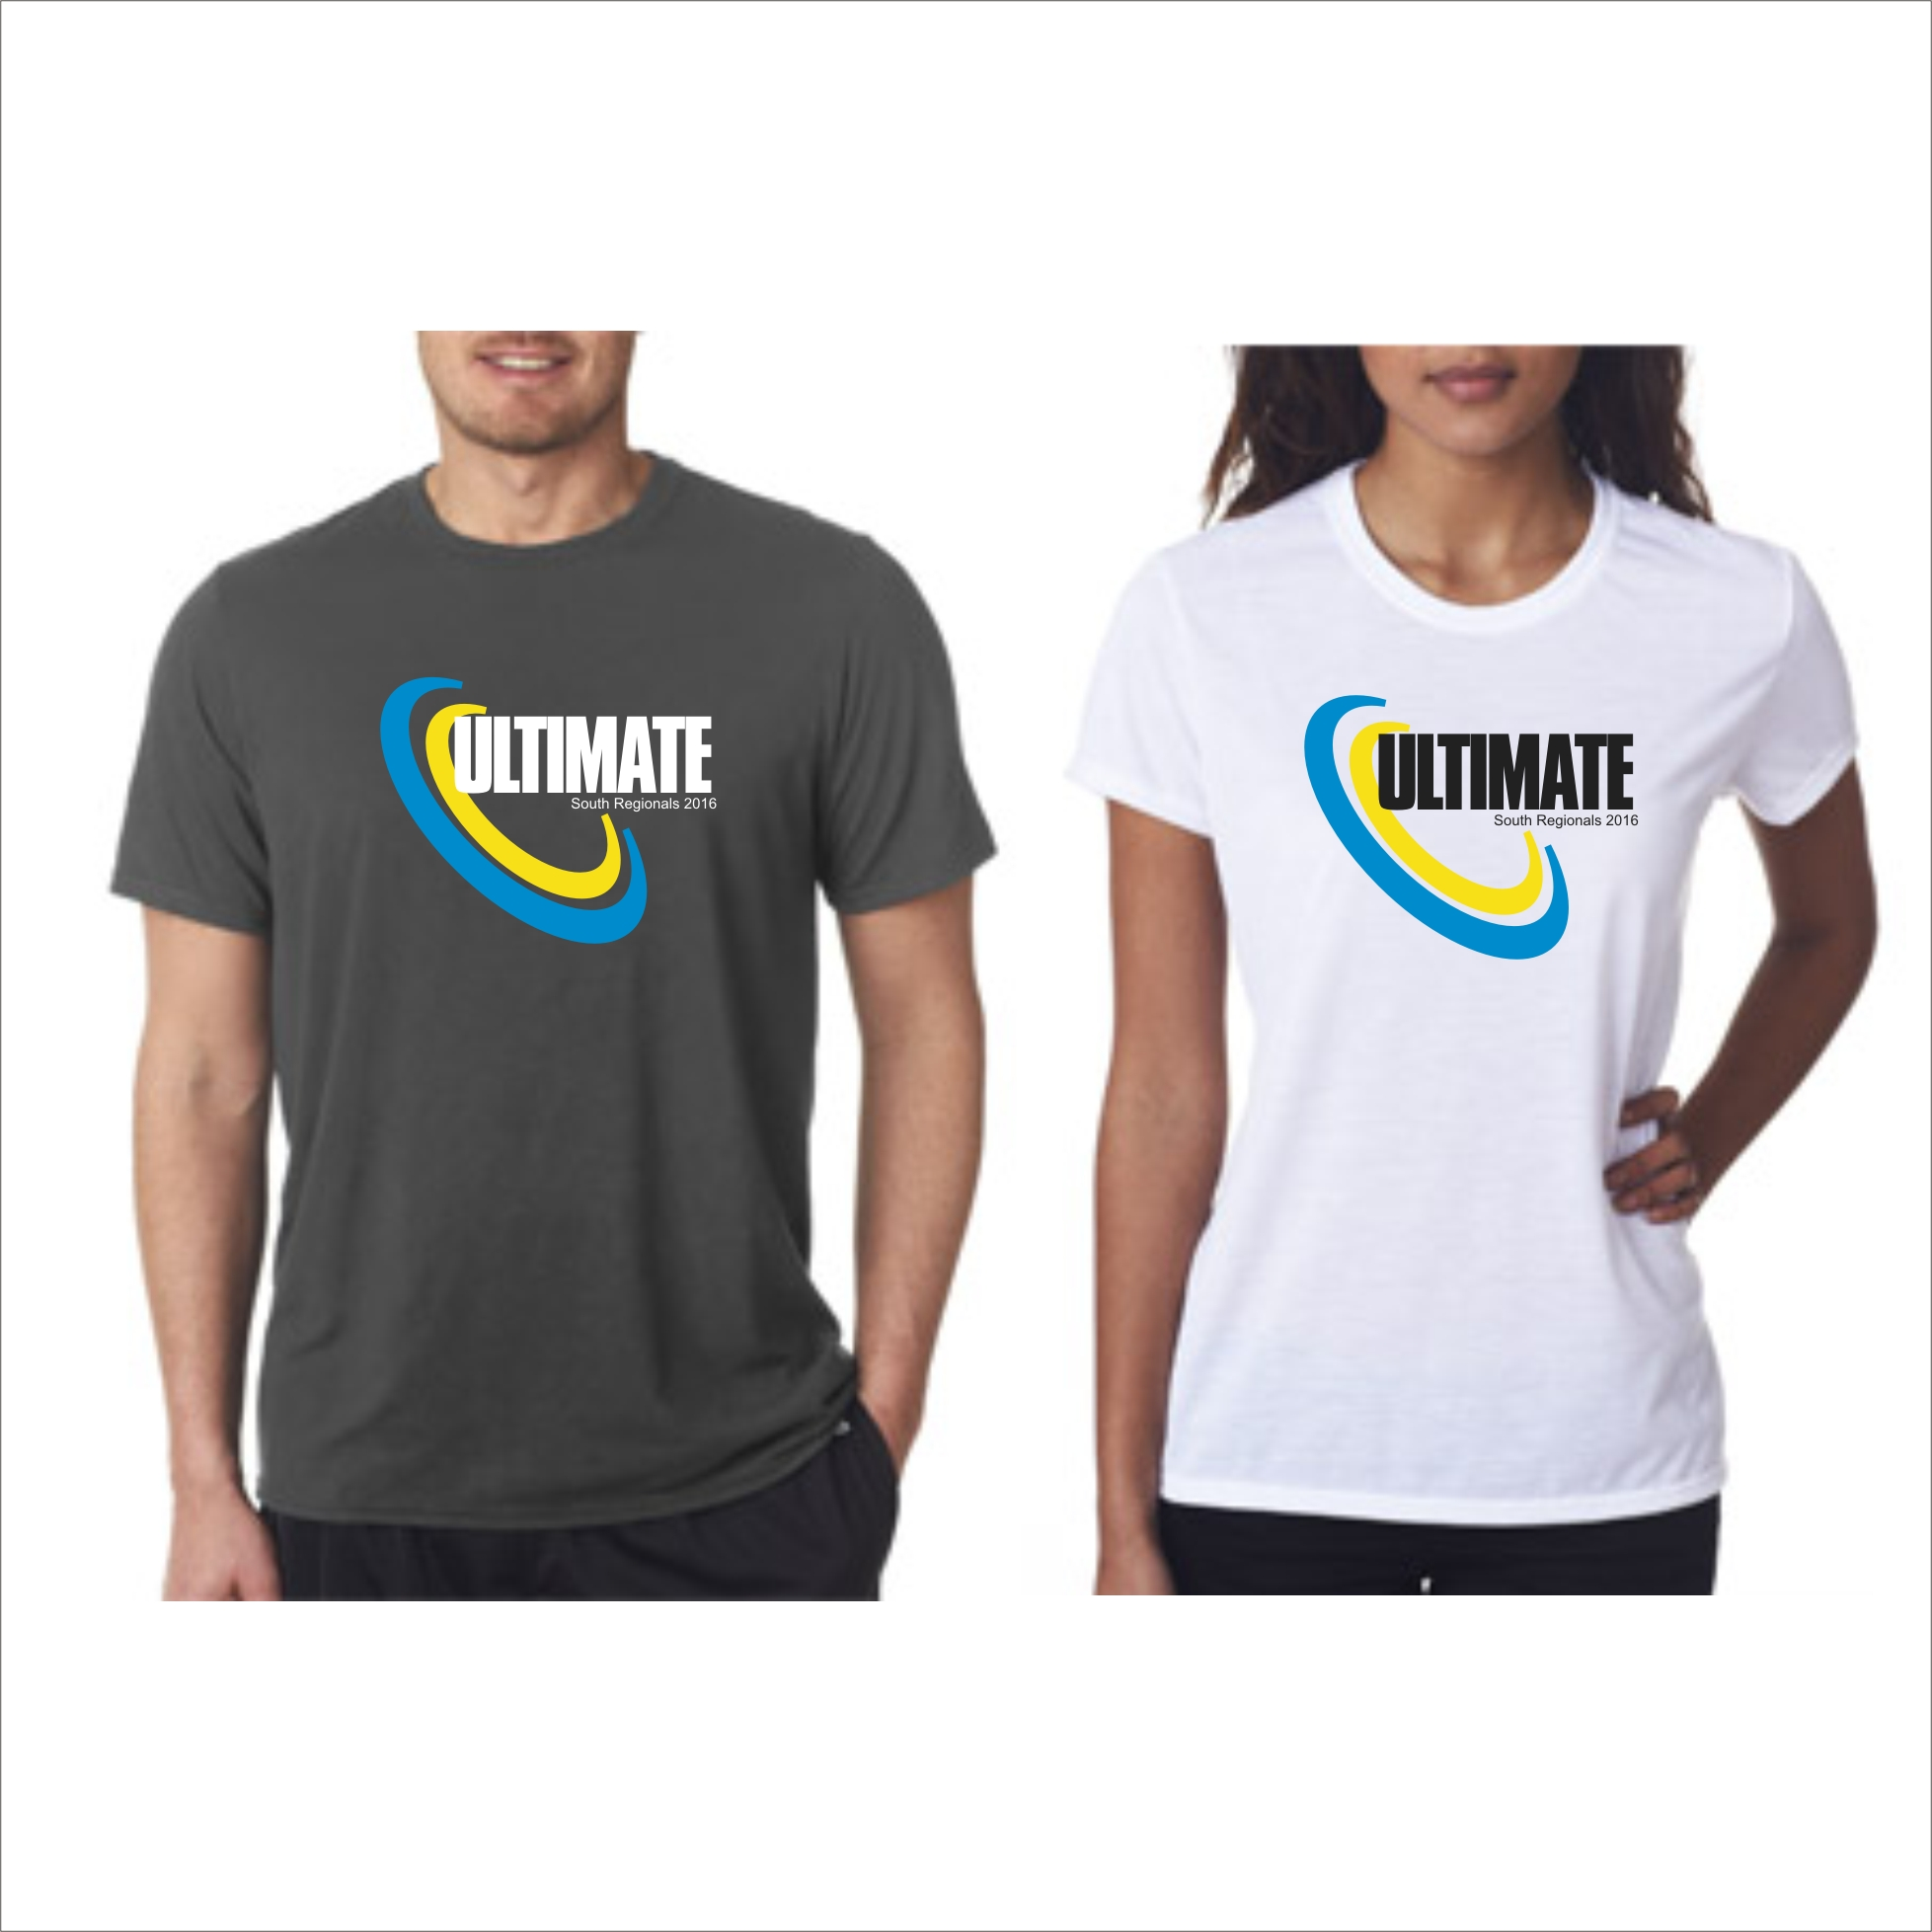 2016 Ultimate tshirt single.jpg